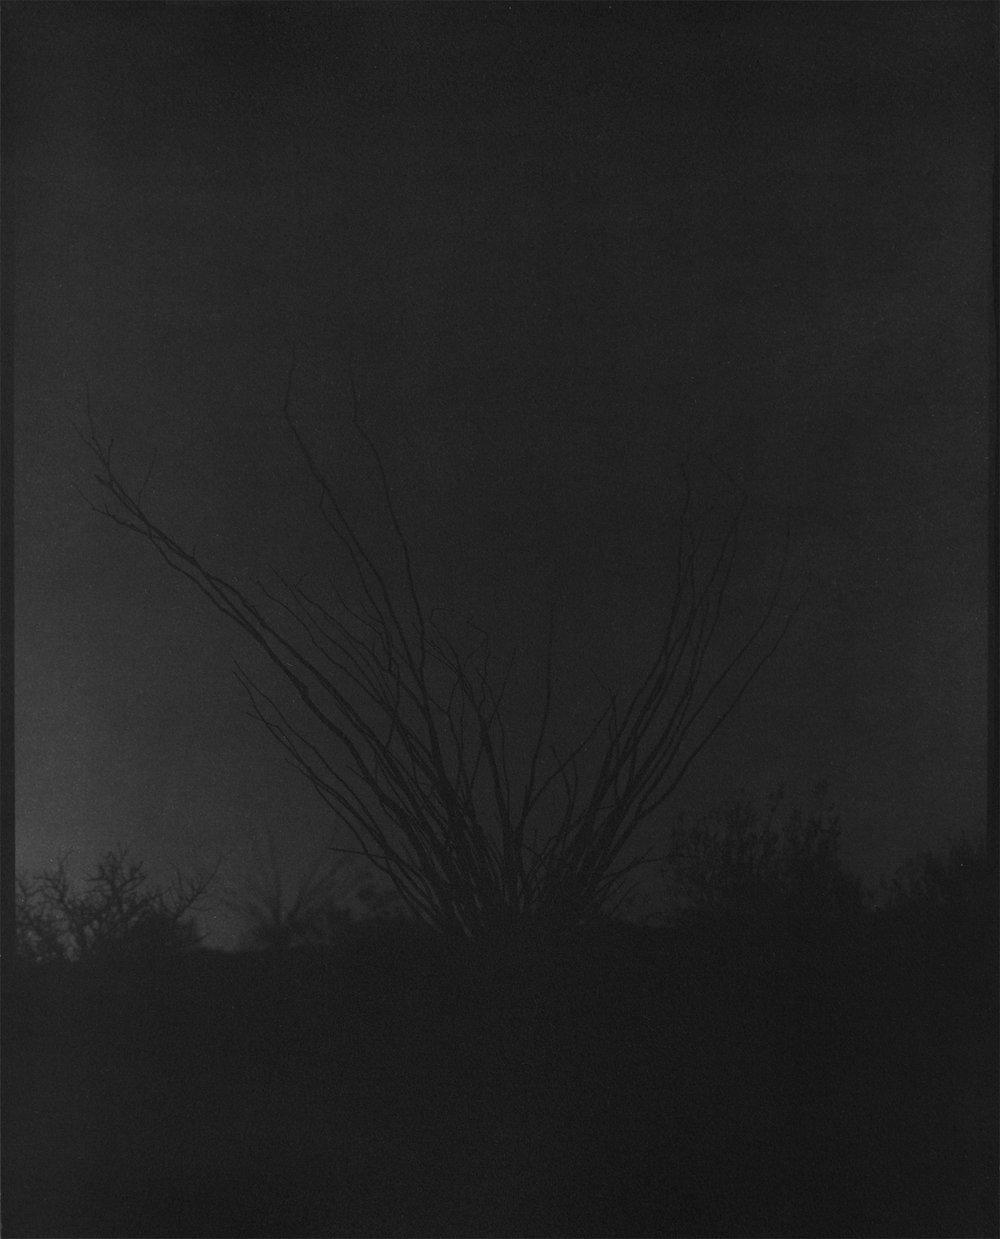 scott b davis   ocotillo, ocotillo (no. 40),  2016   platinum/palladium print   20 x 16 inches   edition 1/5